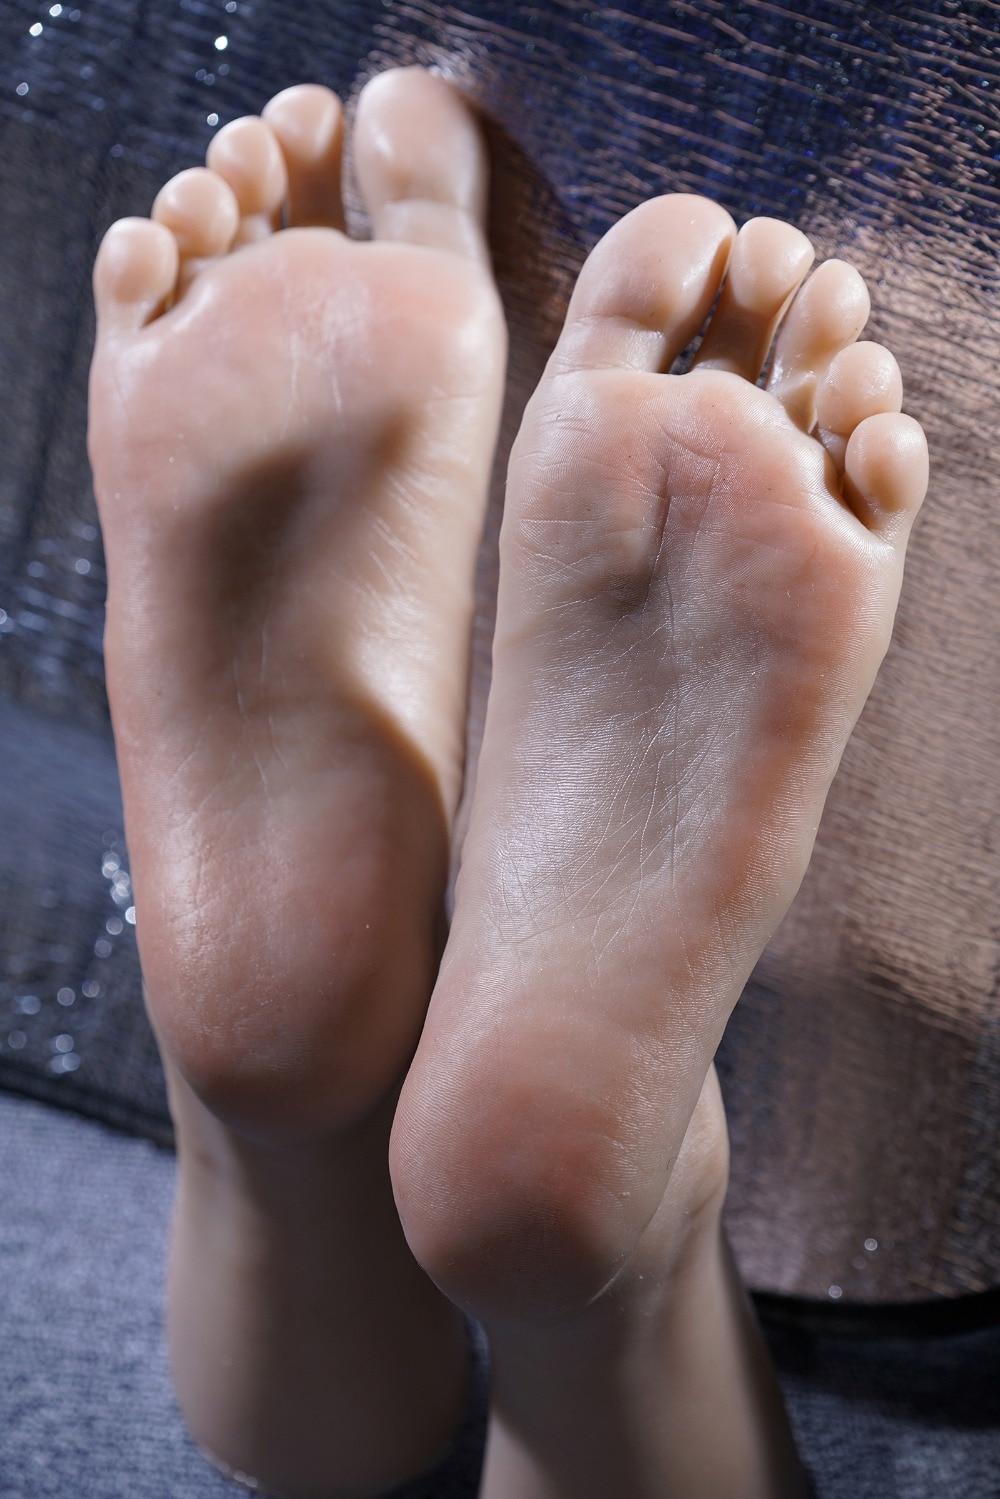 Newest 3D Tickling kiss font b sex b font male foot feet fetish sculpture model foot